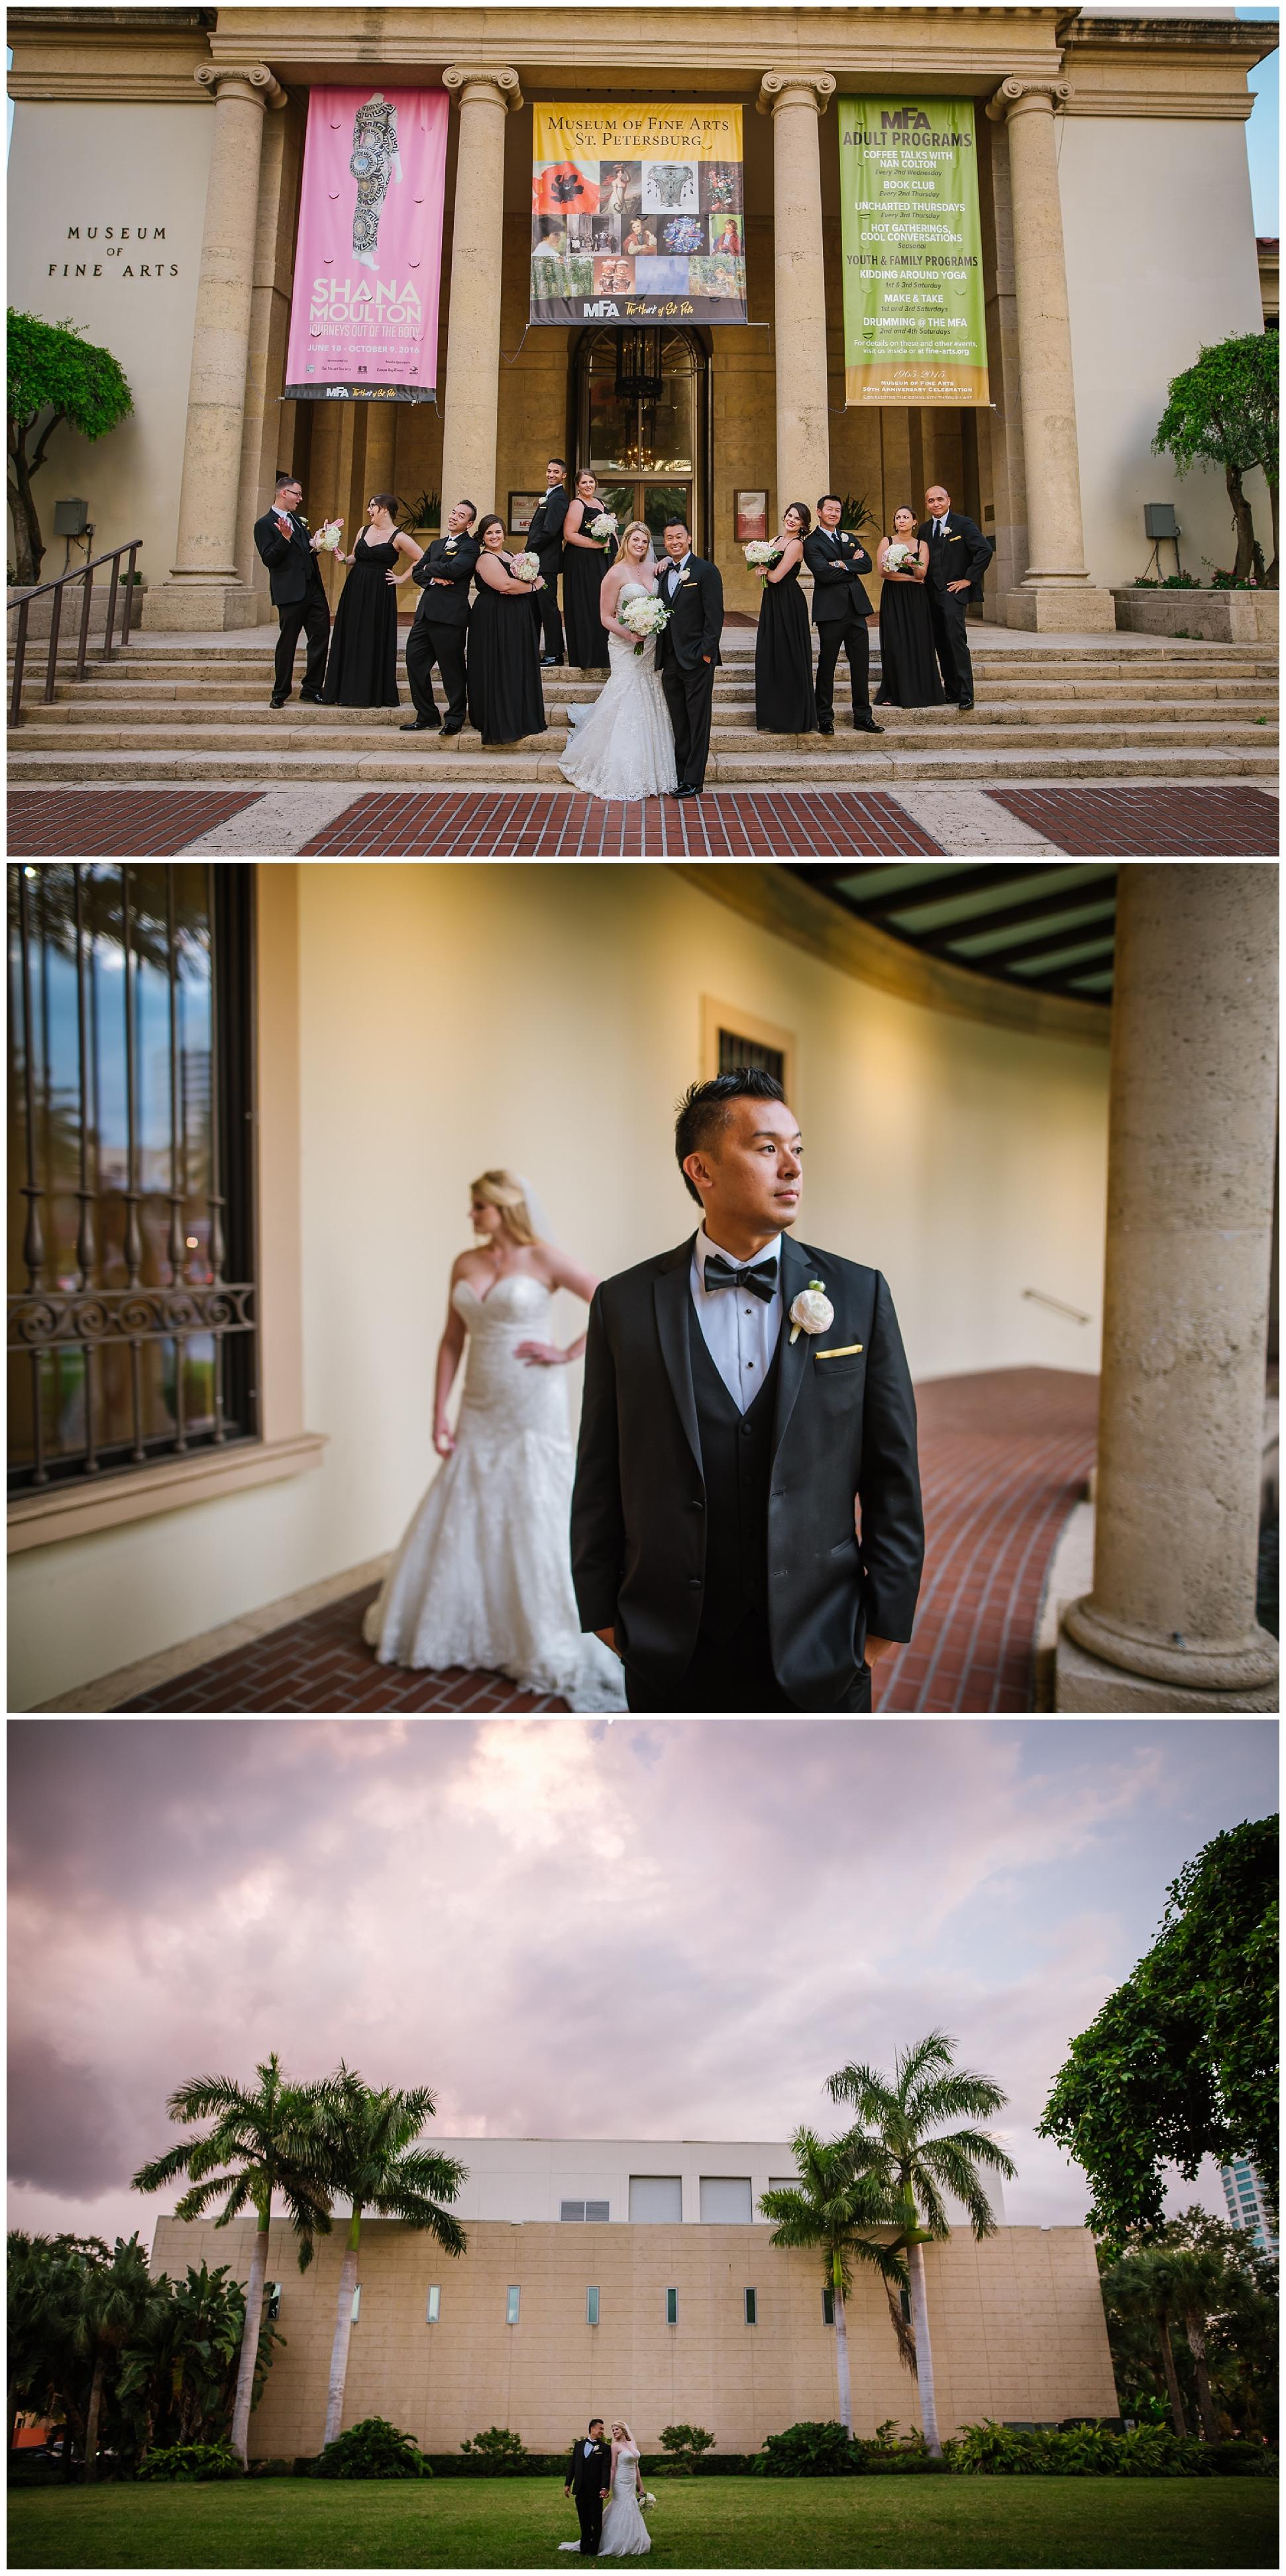 Ashlee-hamon-photography-year-in-review-2016-travel-wanderlust-vsco-adventure-wedding_0093.jpg